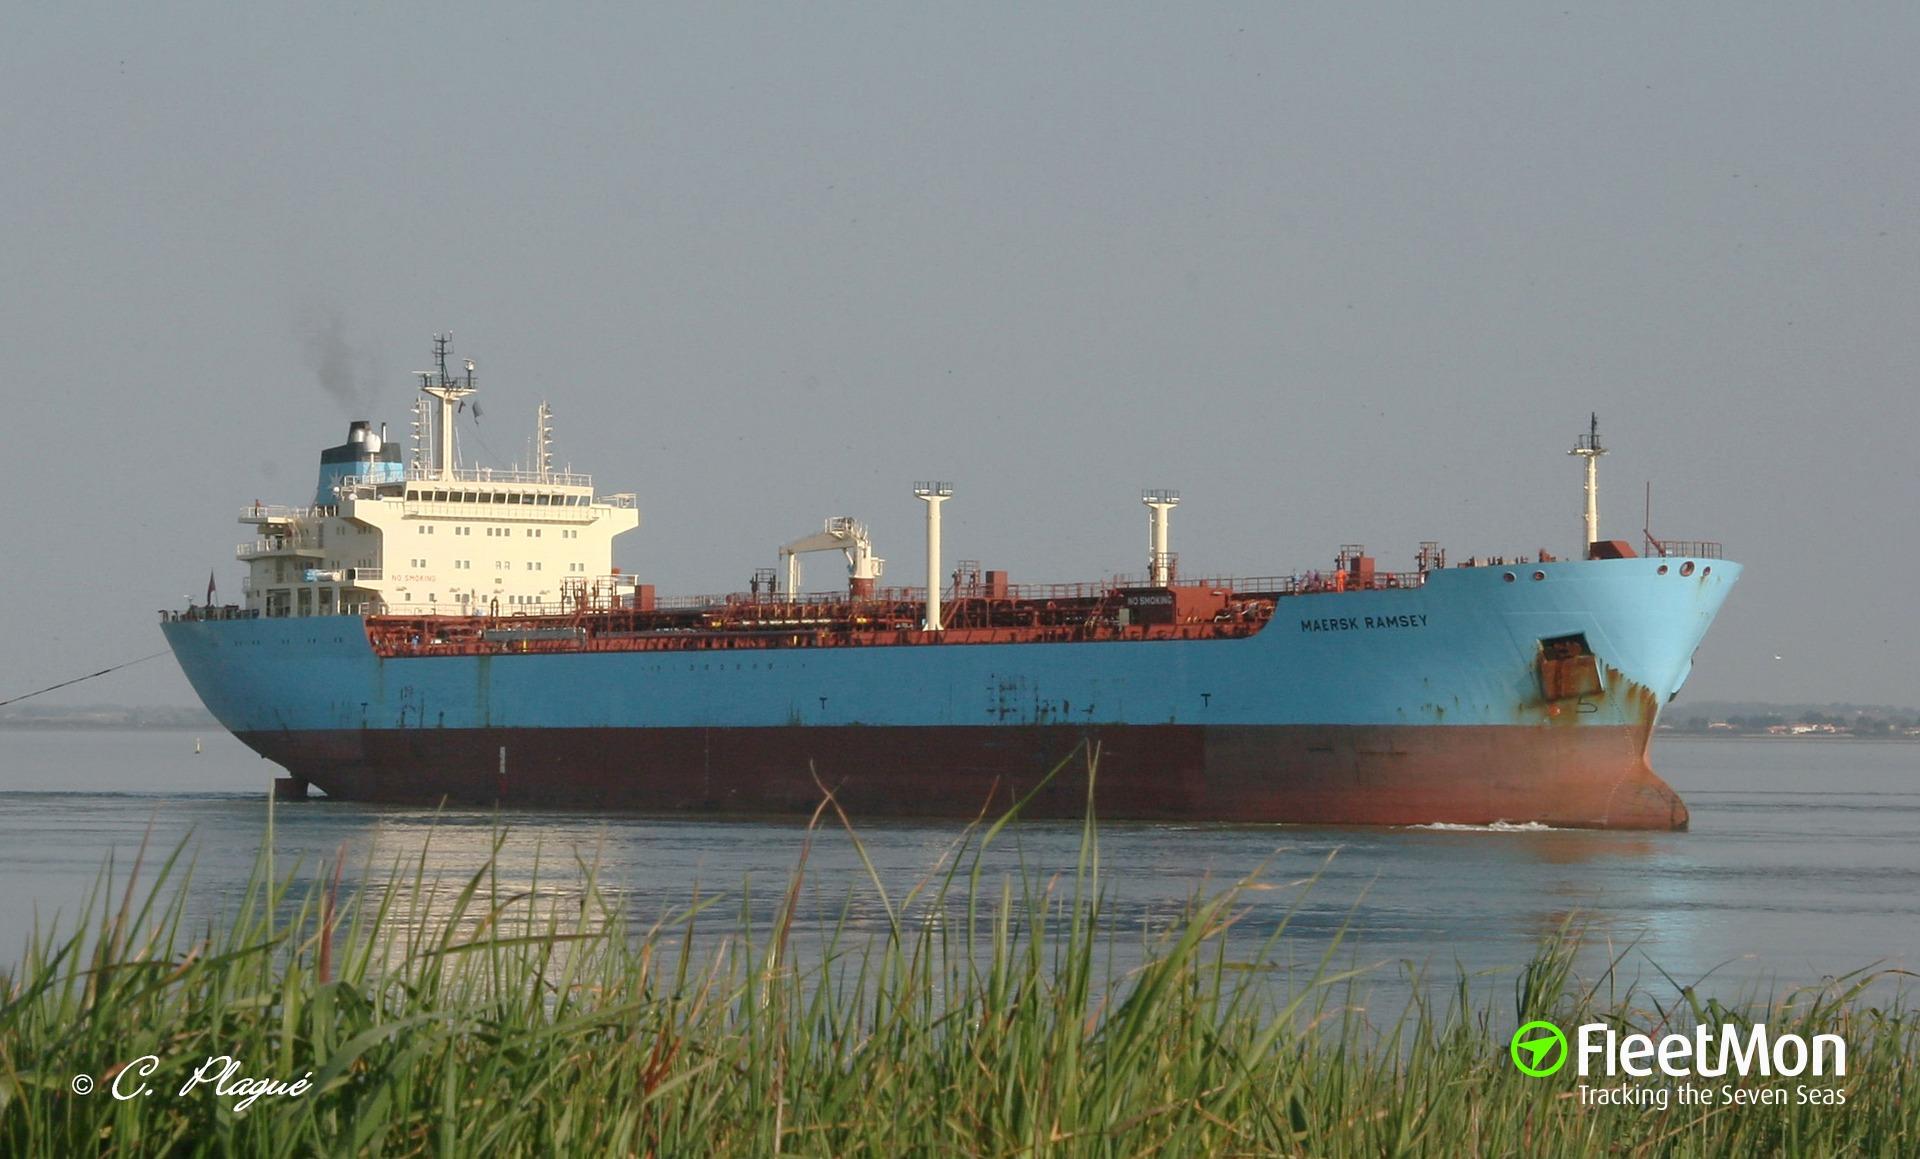 Tanker on fire after jets attack, Libya